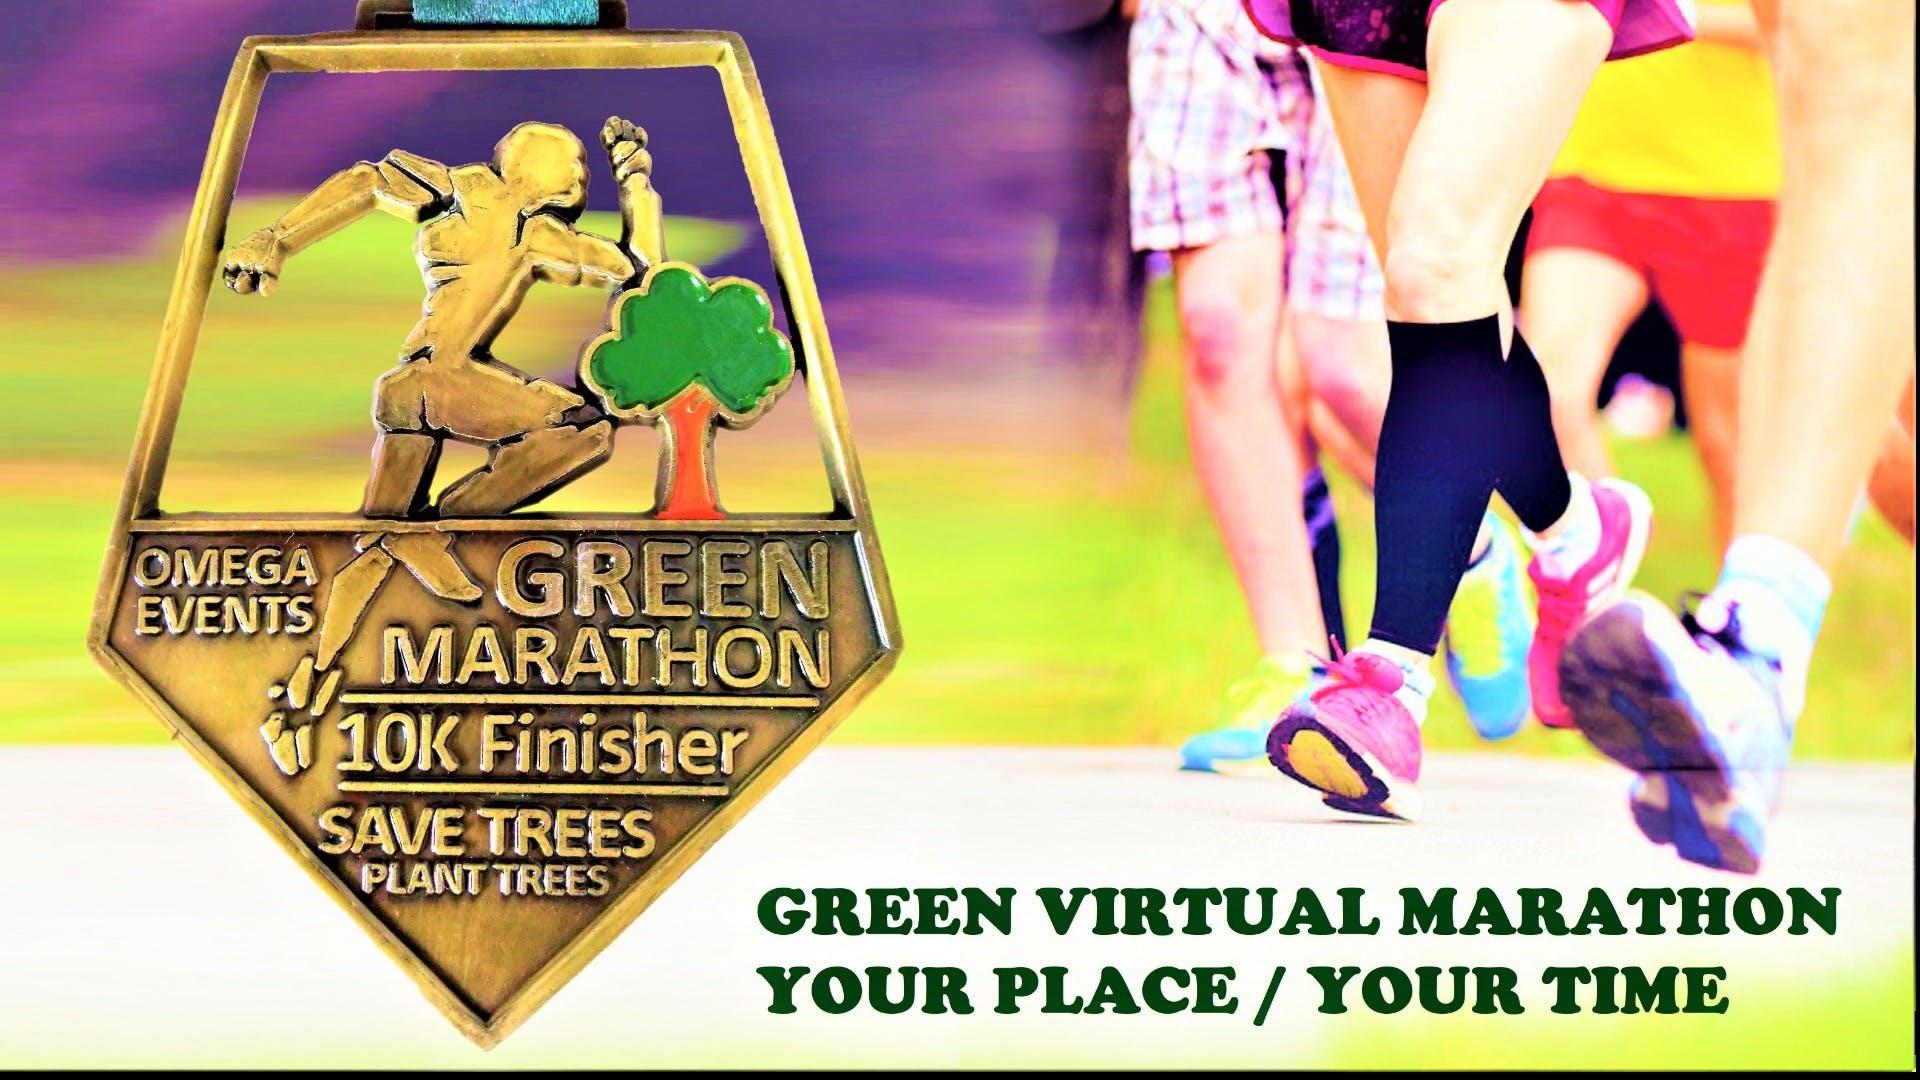 Green Virtual Marathon – Get India's Biggest Medal